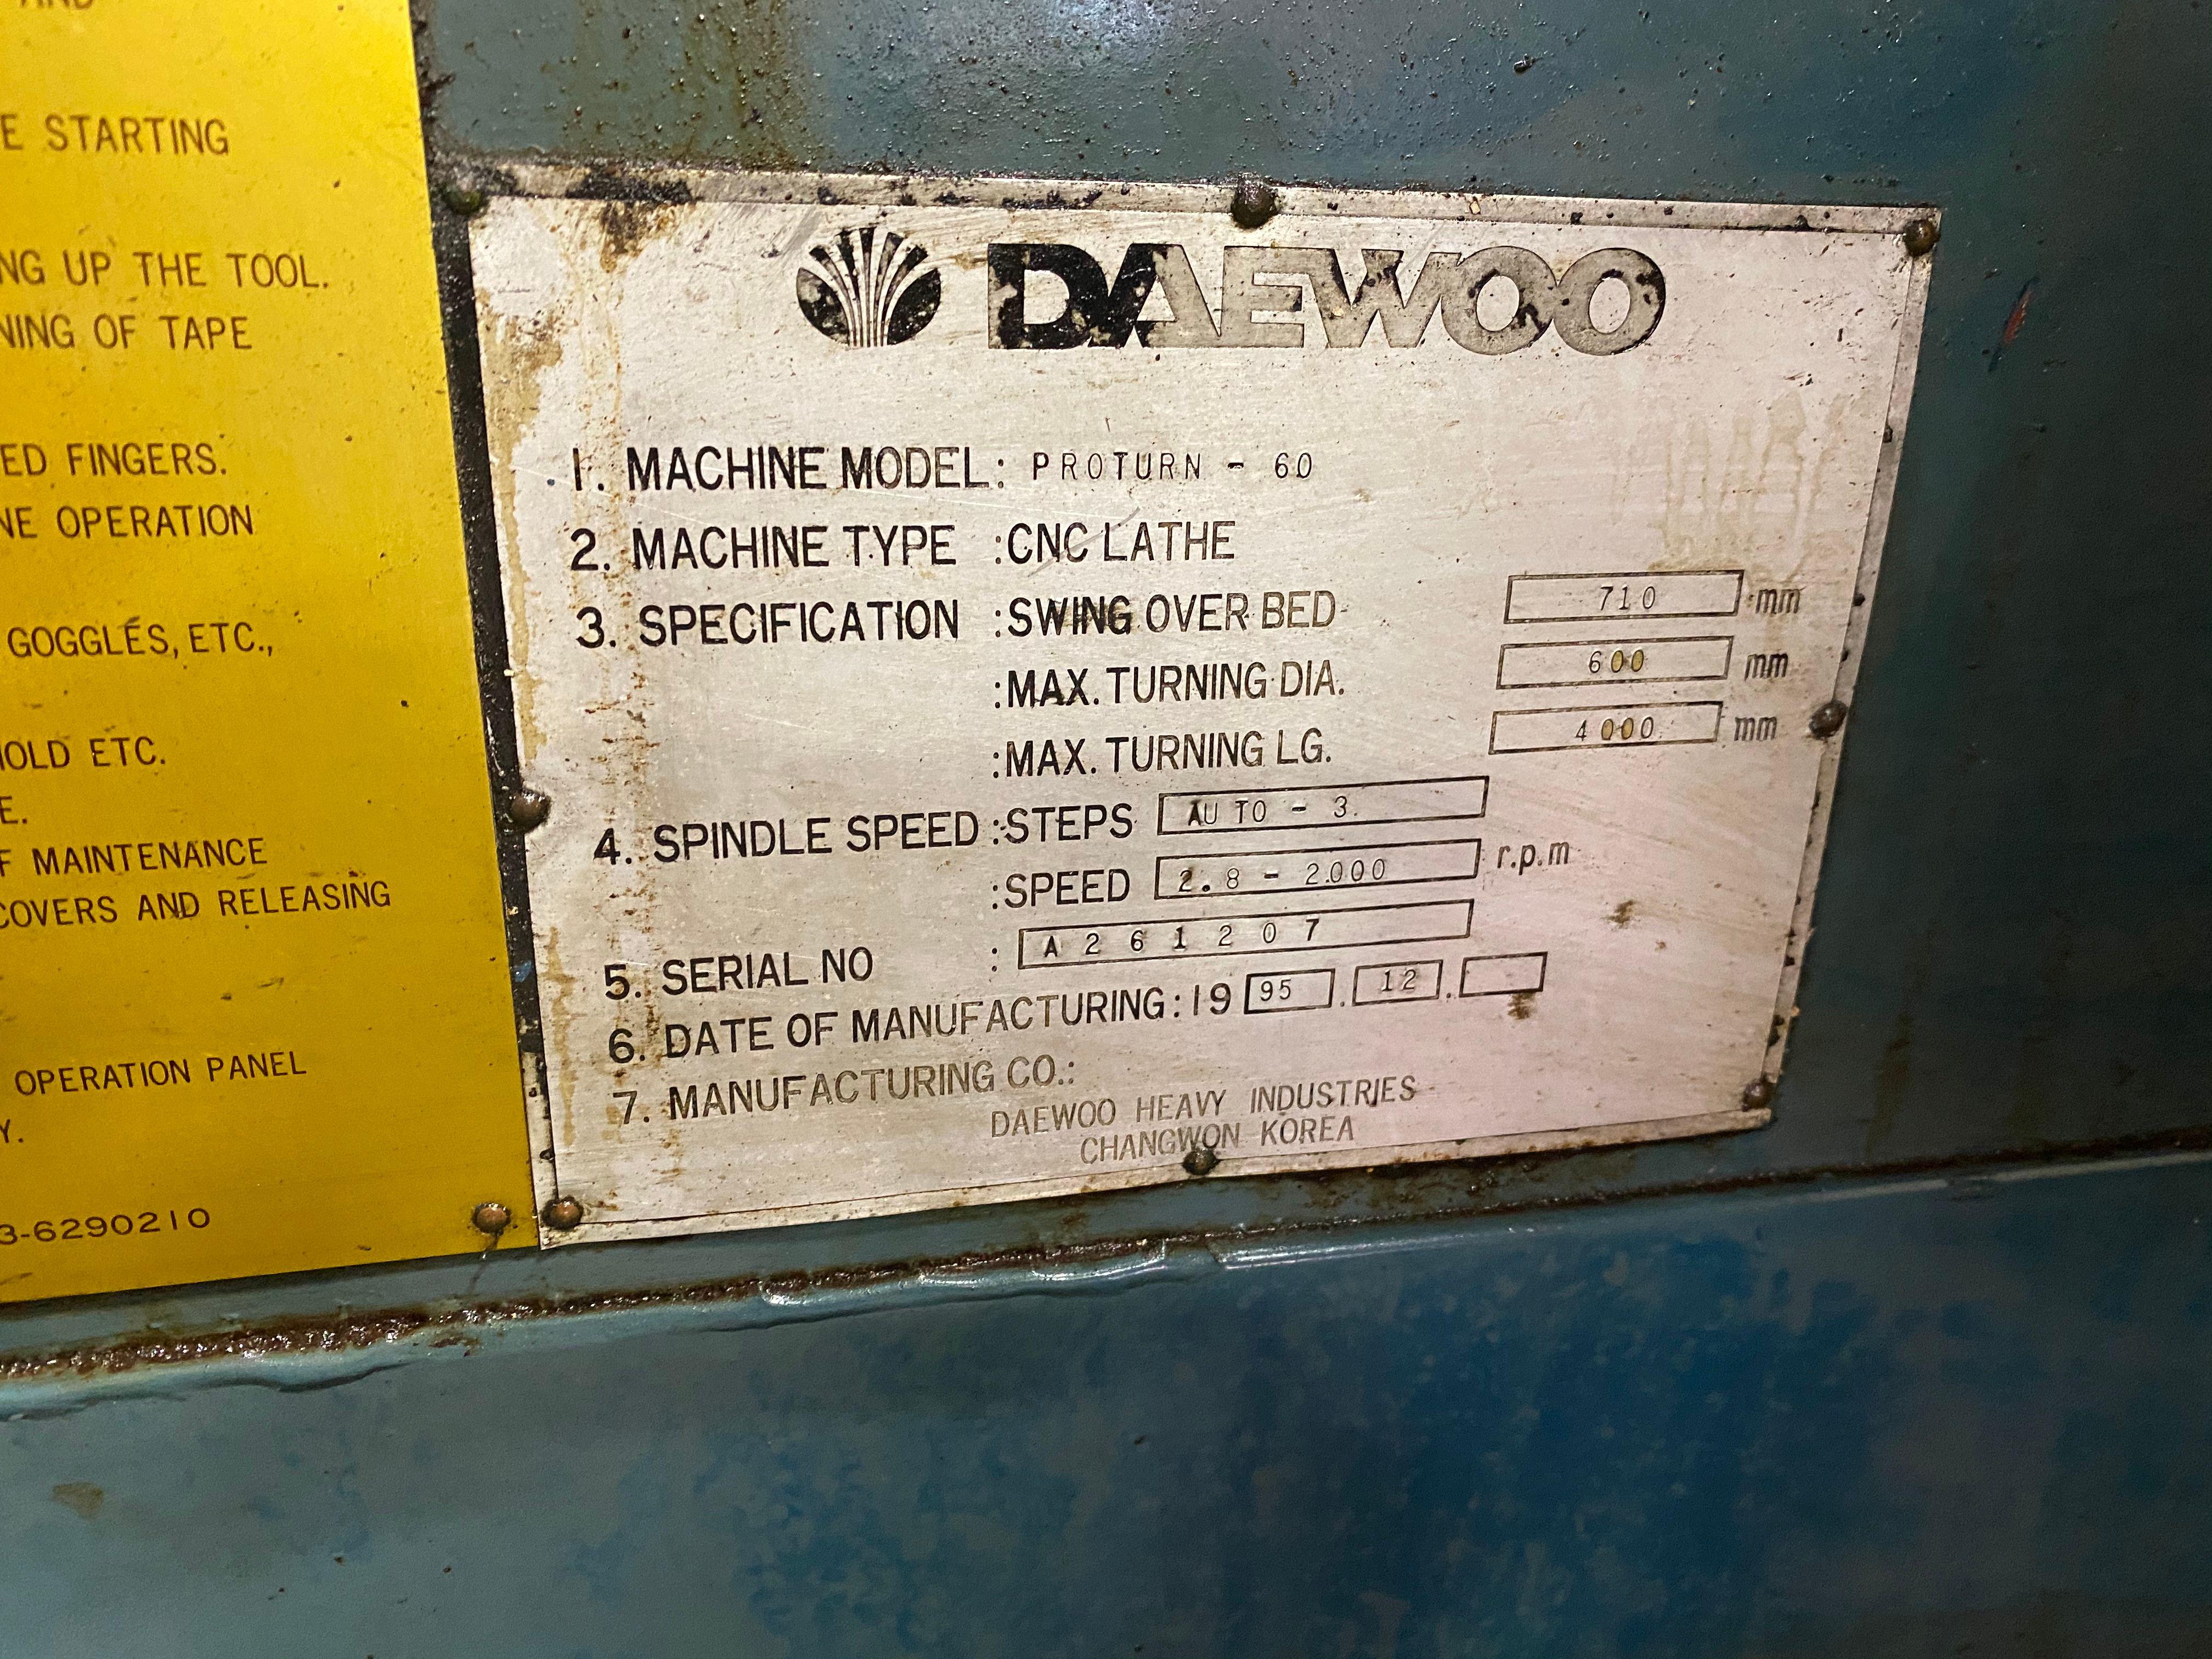 DAEWOO PROTURN 60